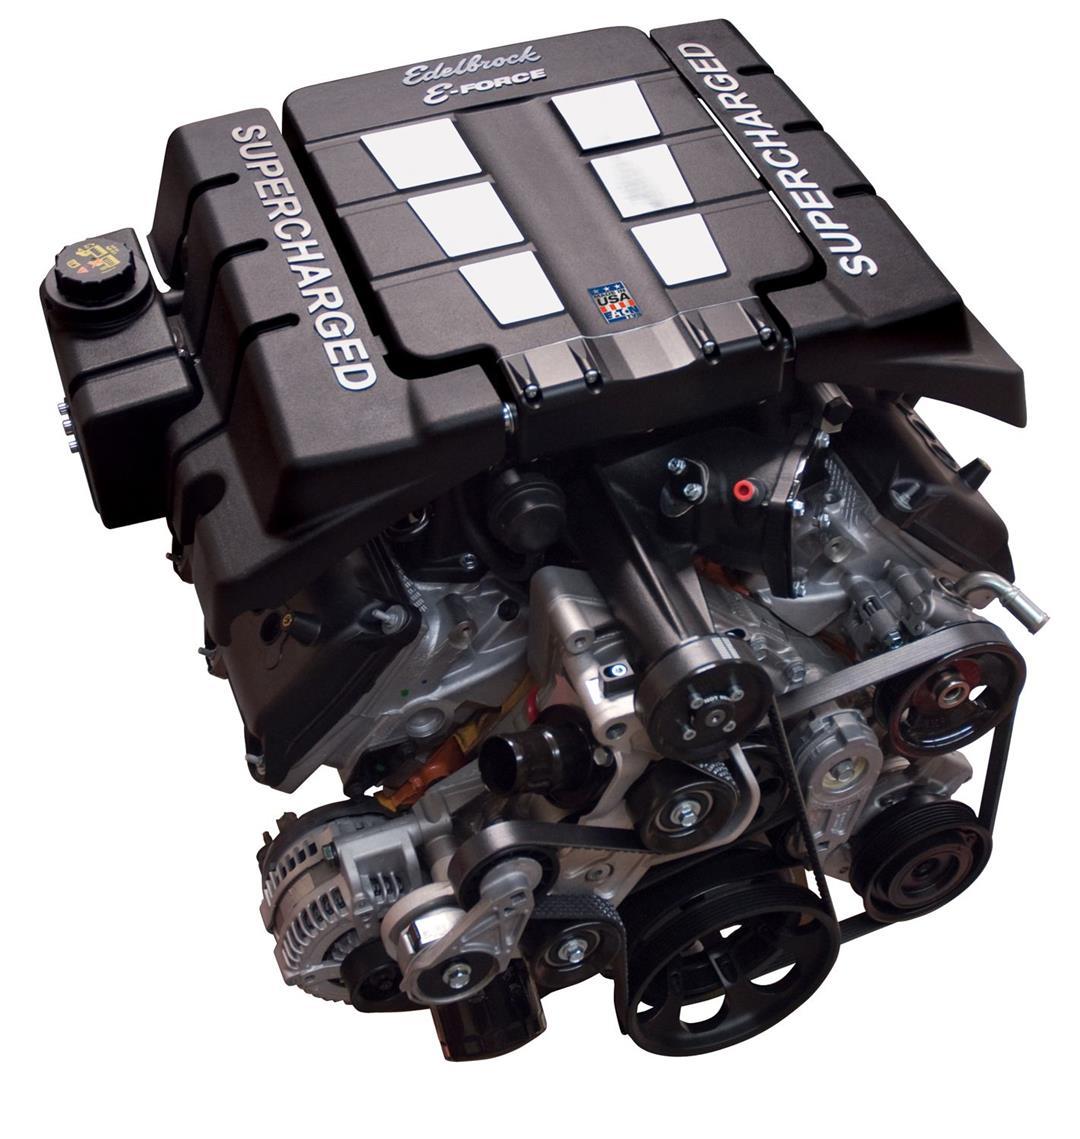 2006-2008 Hemi Supercharger 5.7